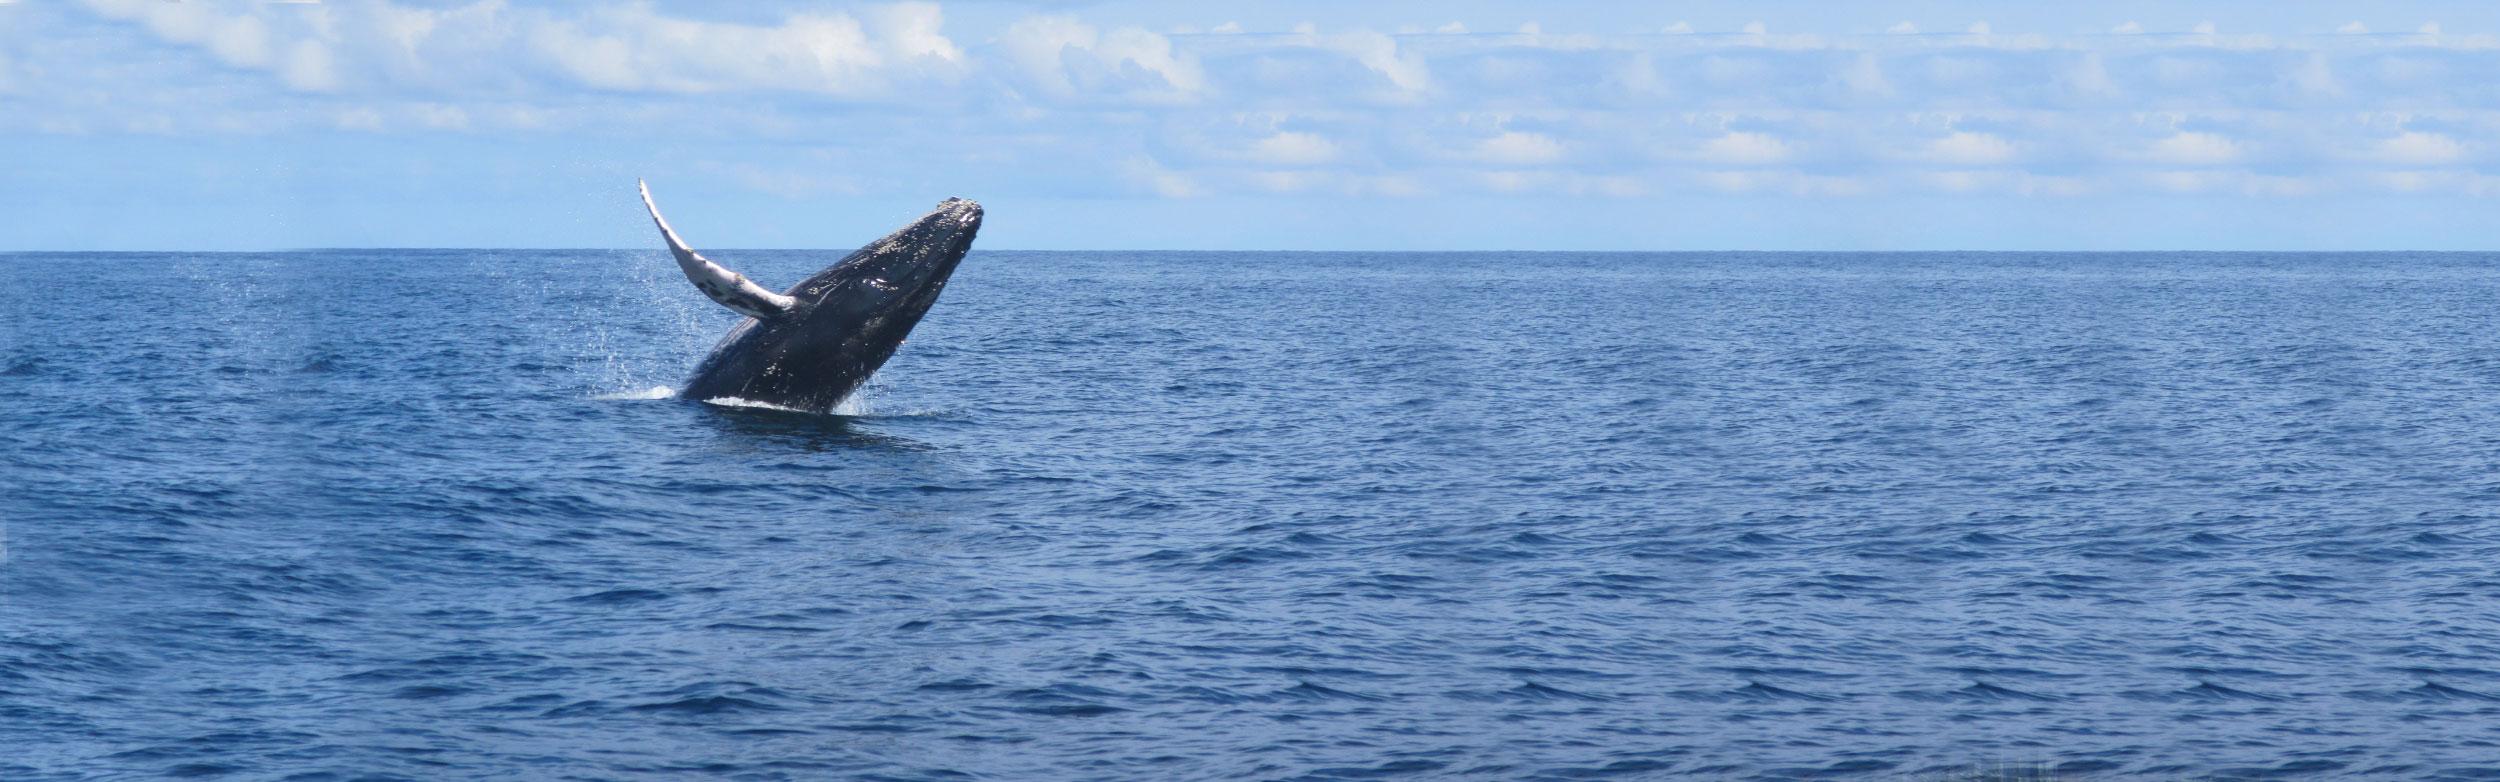 Panama Bay Whale Watching